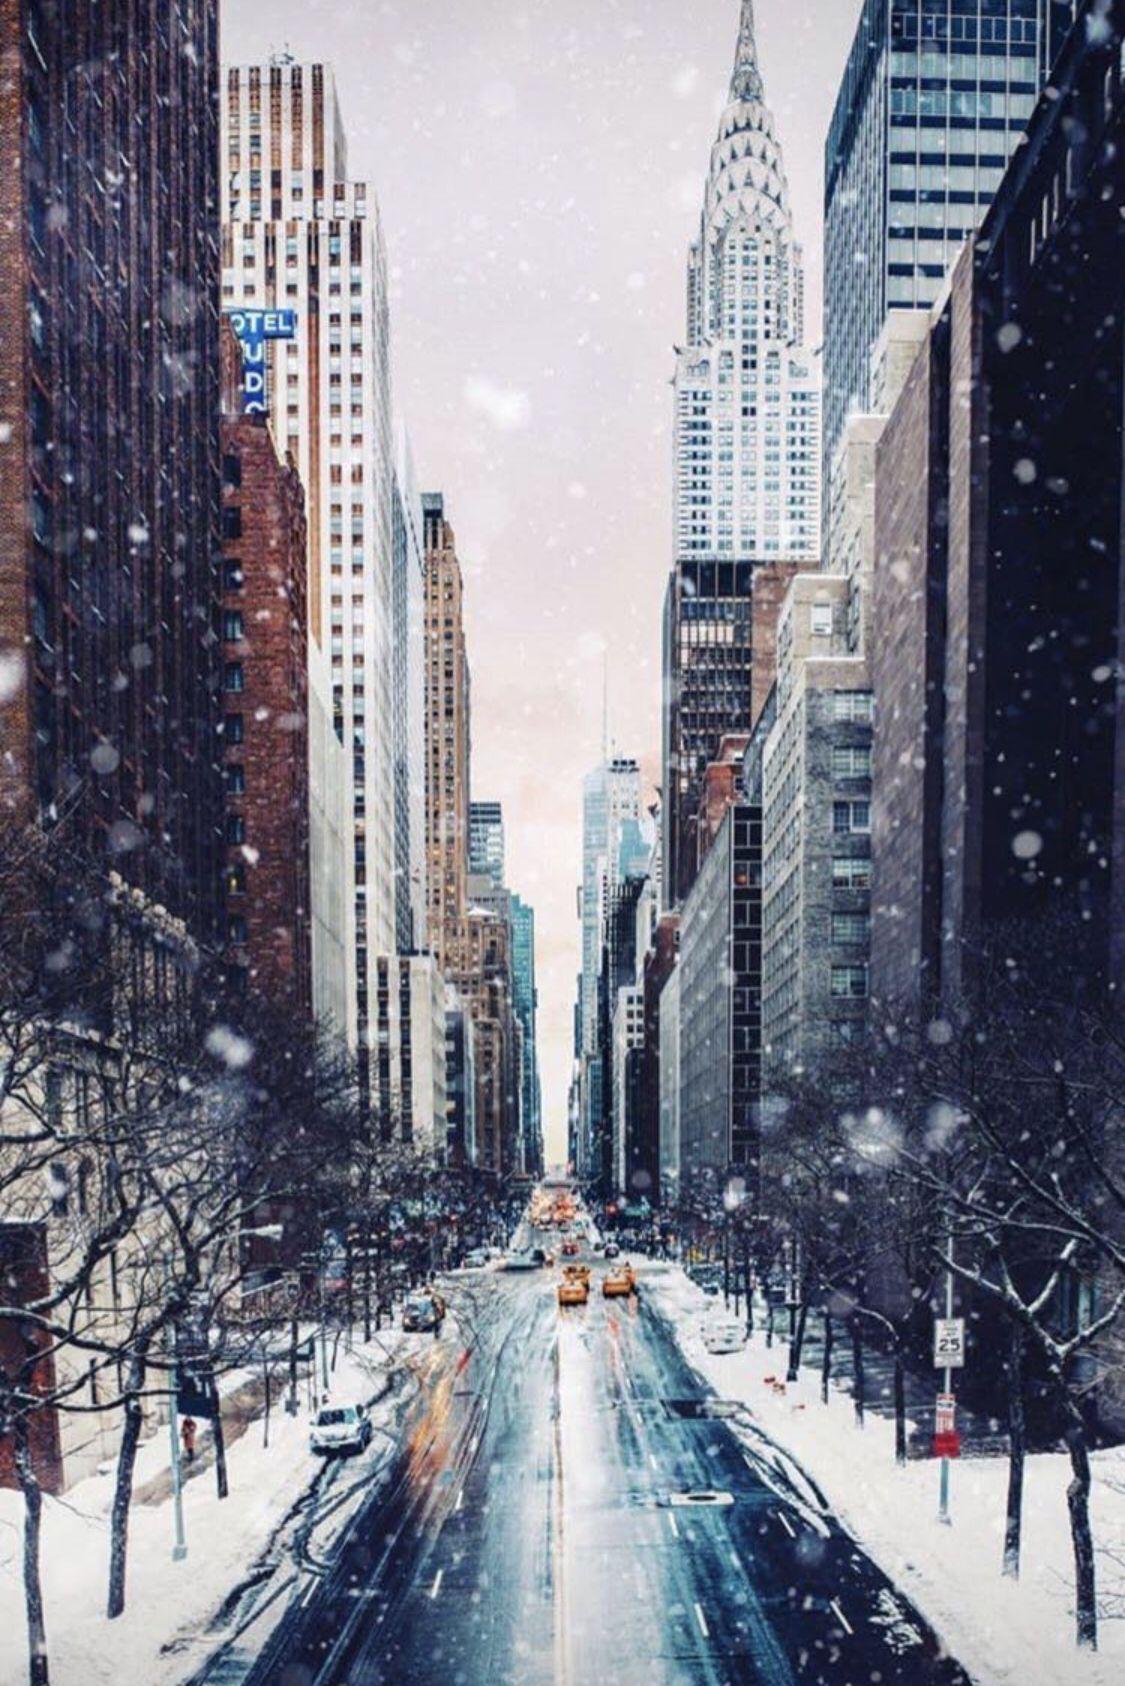 Follow Littlemissperfect For More Insta Lil Loca Lil City Wallpaper Winter Photography Winter Wallpaper